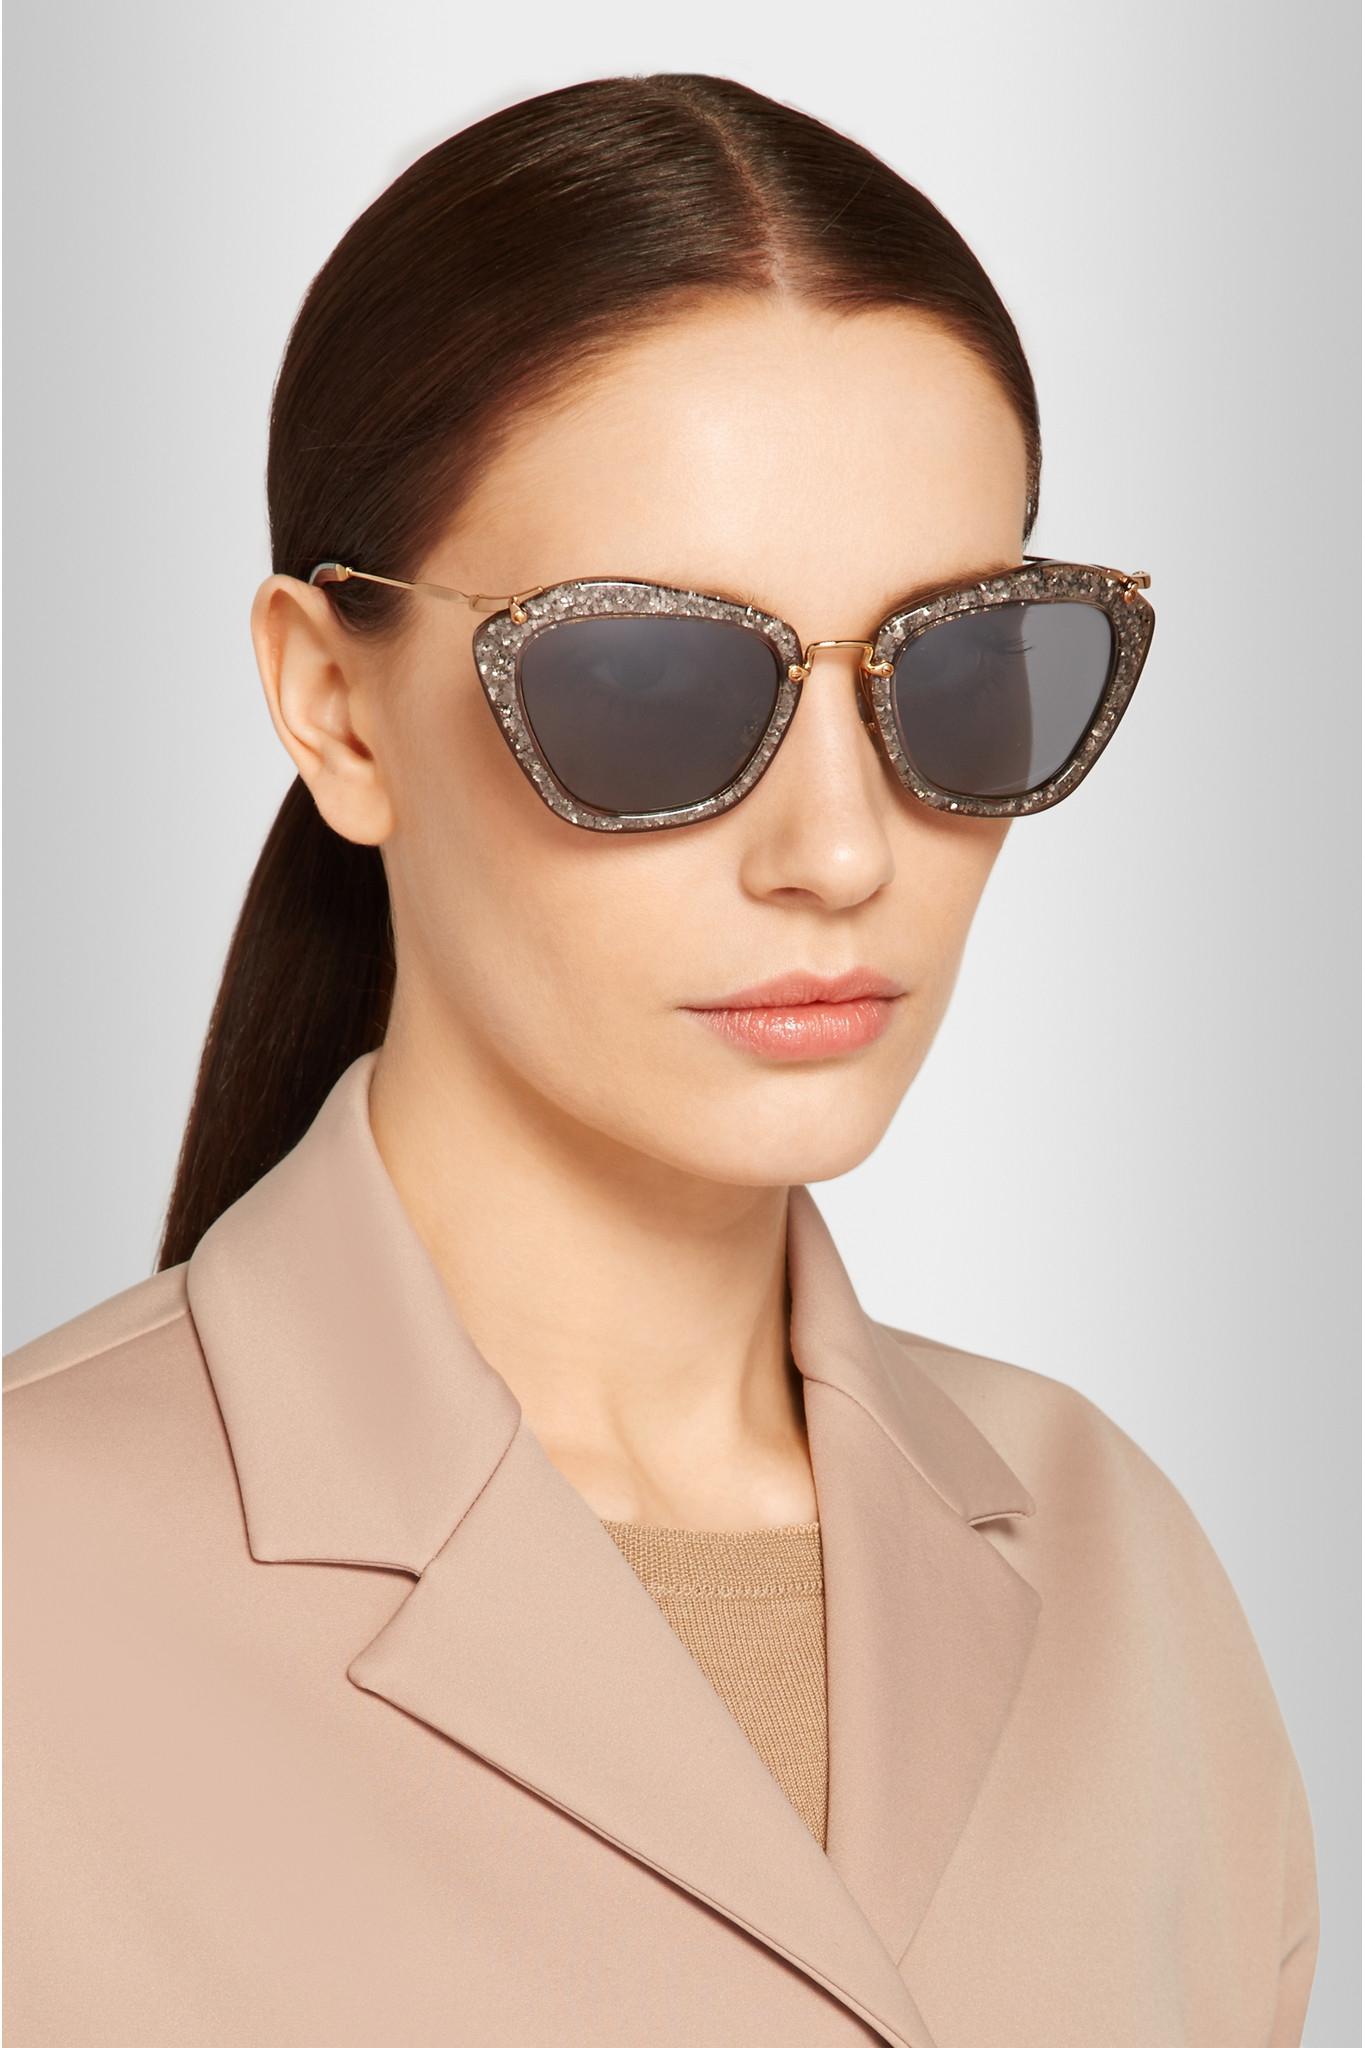 56725db47568 Miu Miu Cat-eye Glittered Acetate And Metal Sunglasses in Metallic ...